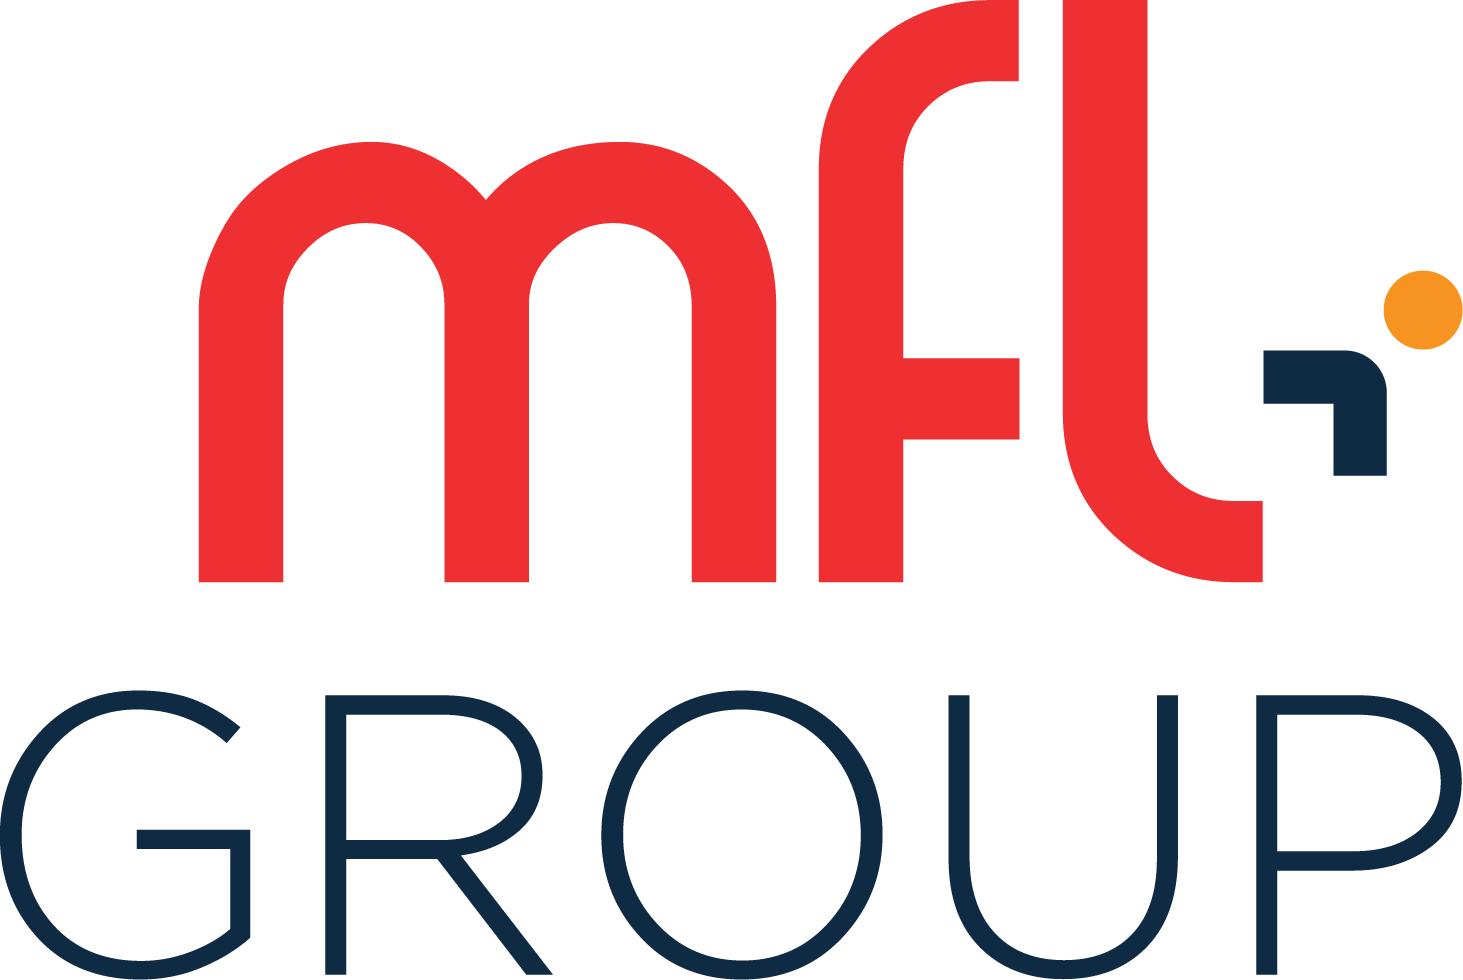 mfl-group-dark-logo-tagline-full-color-rgb